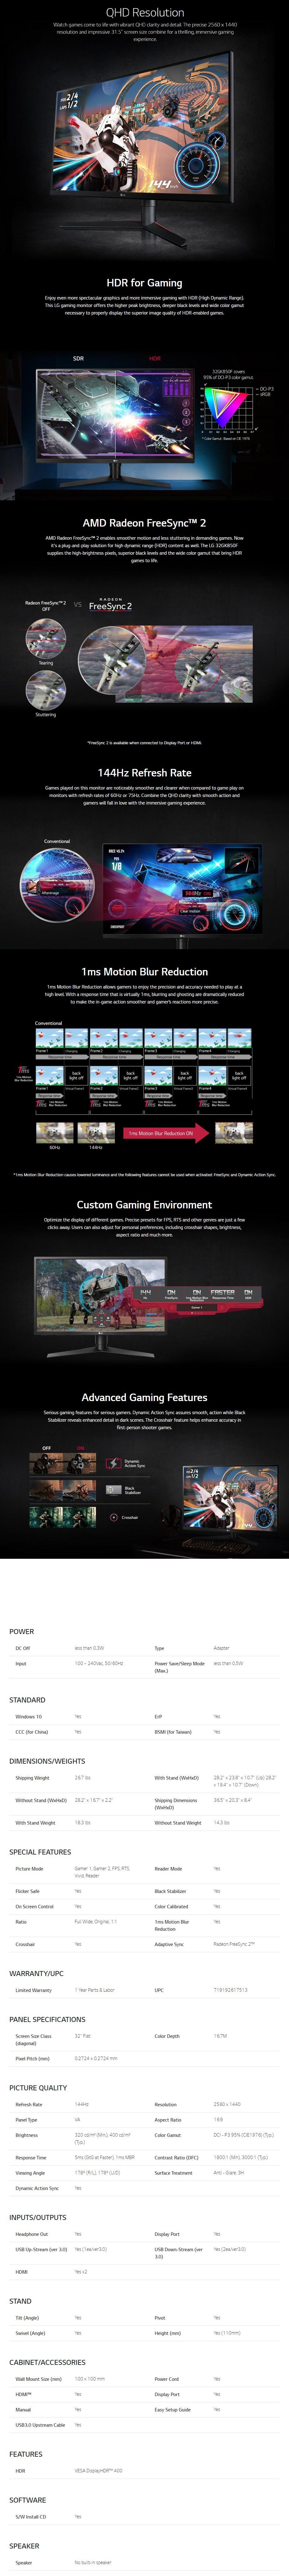 "LG UltraGear 32GK850F 31.5"" 144Hz QHD HDR 1ms FreeSync VA Gaming Monitor - Overview 1"